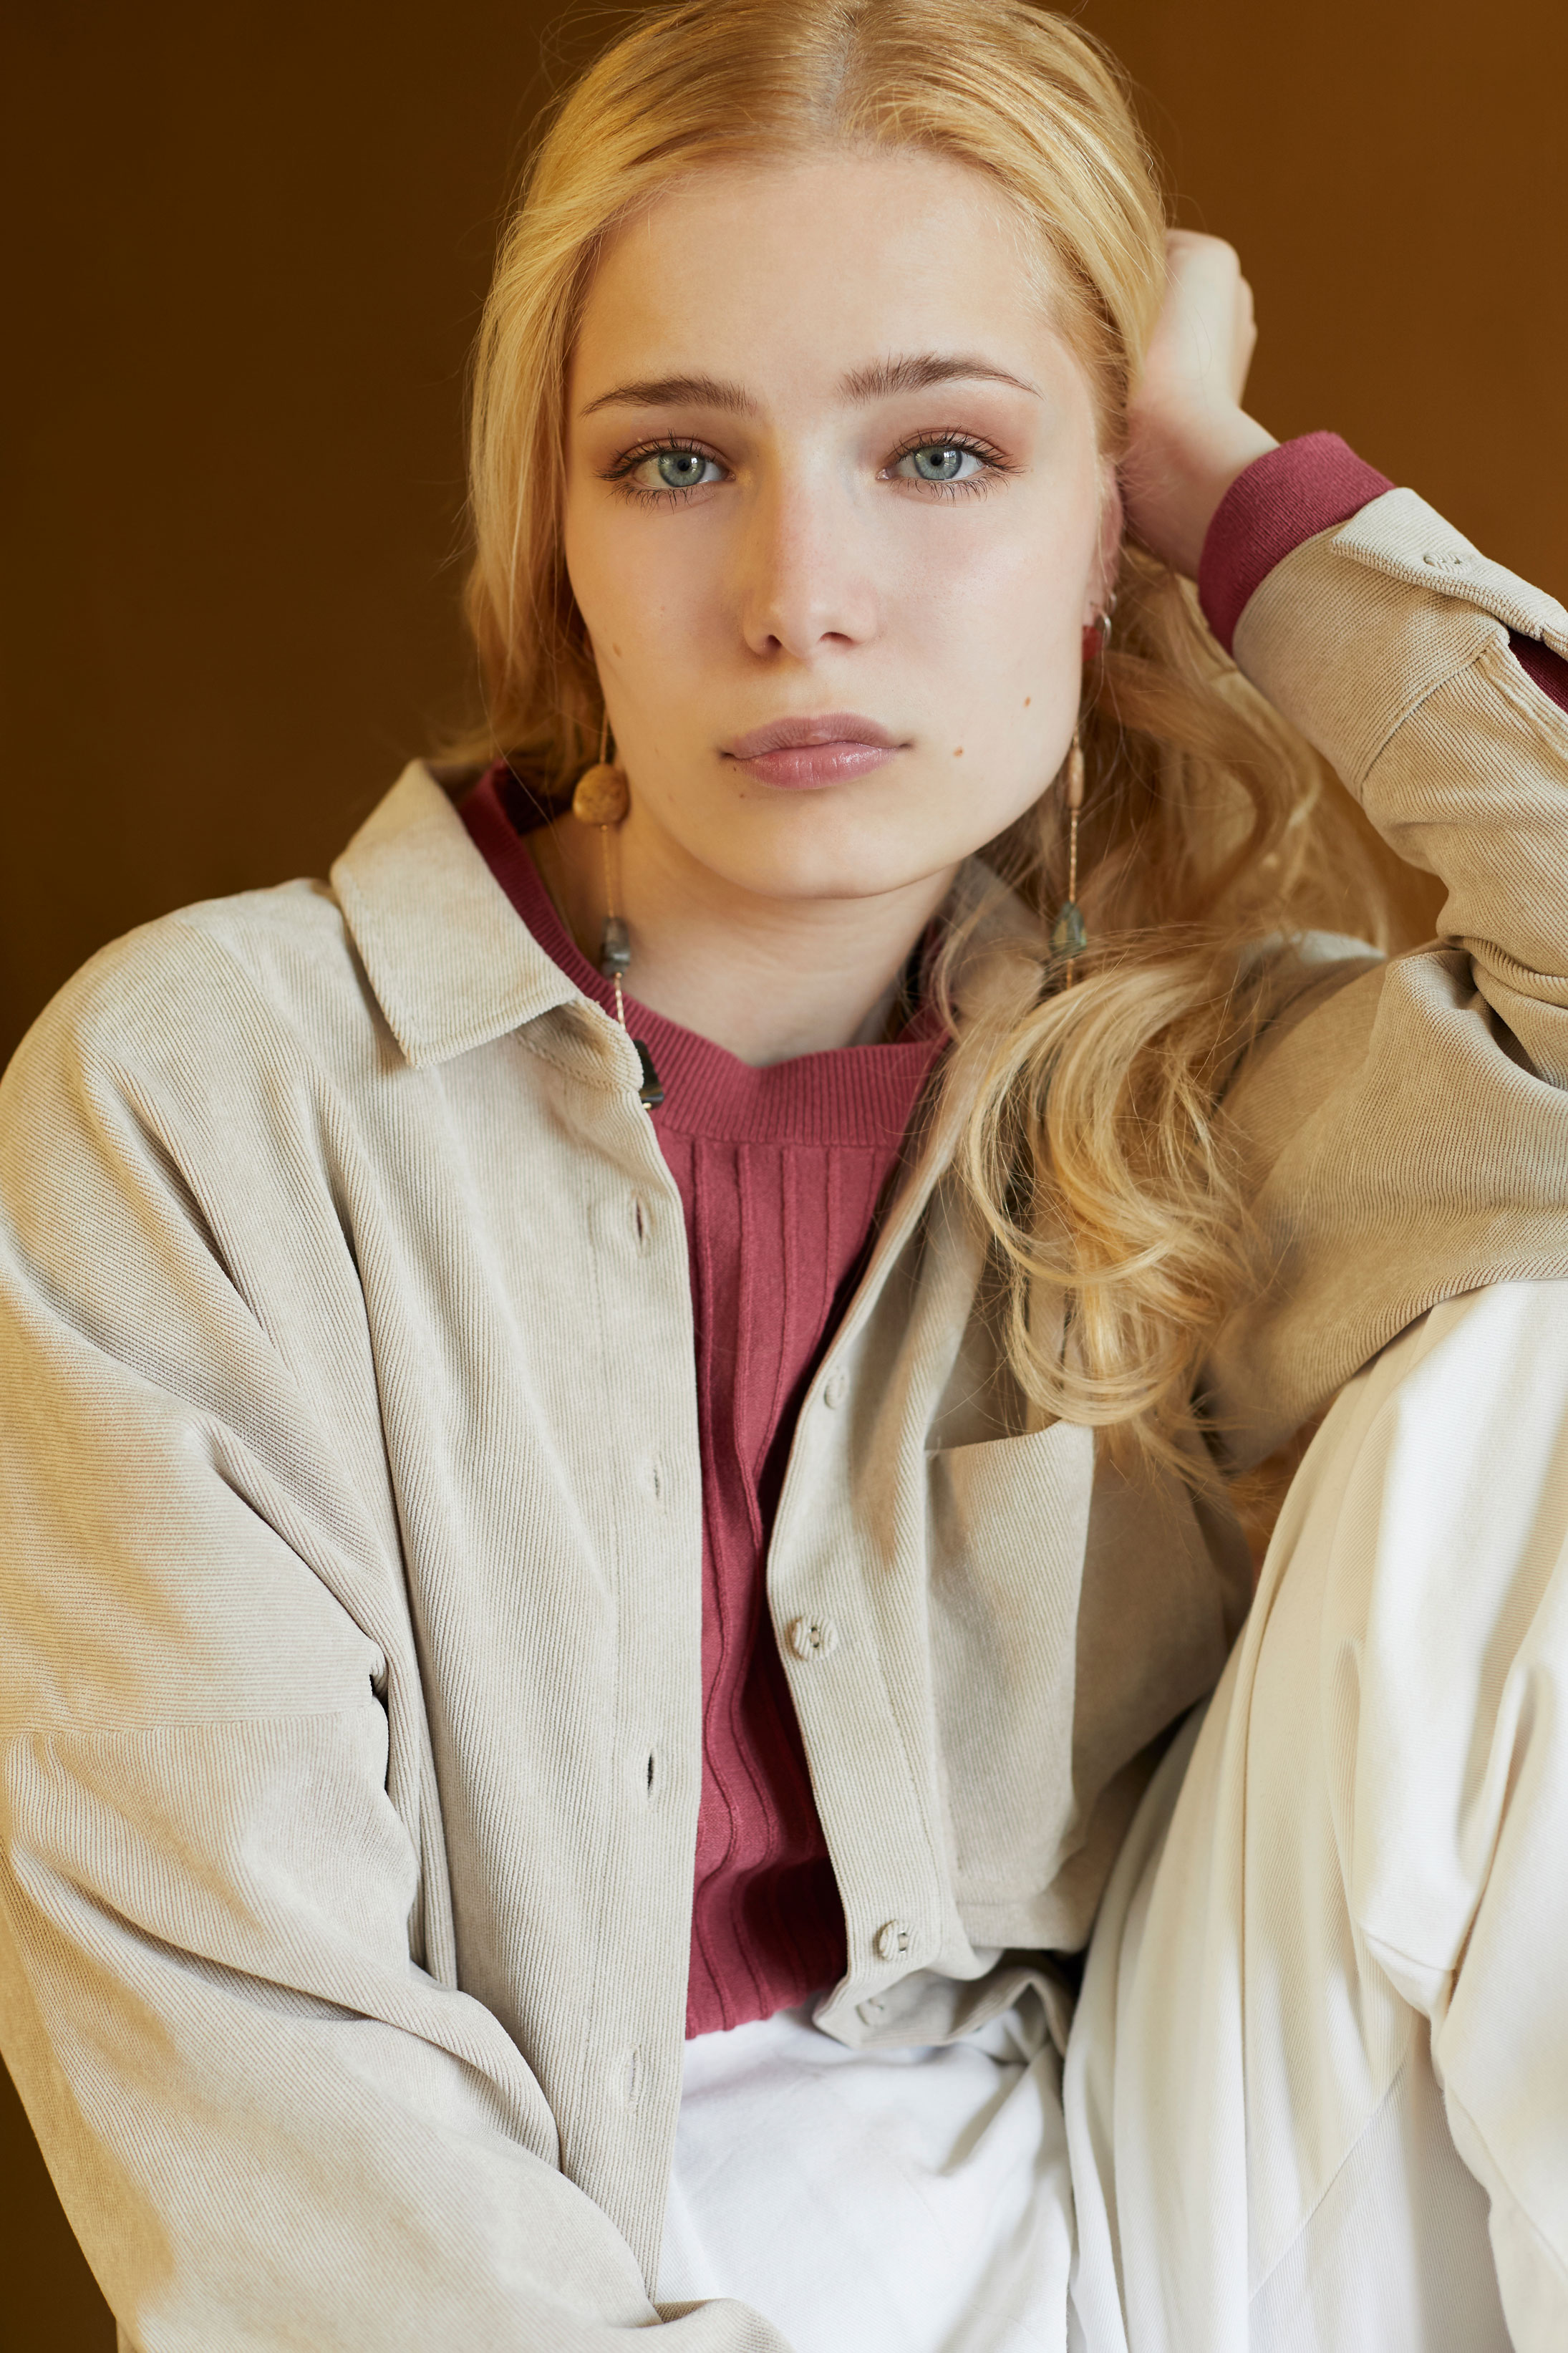 studio photo portrait photographe